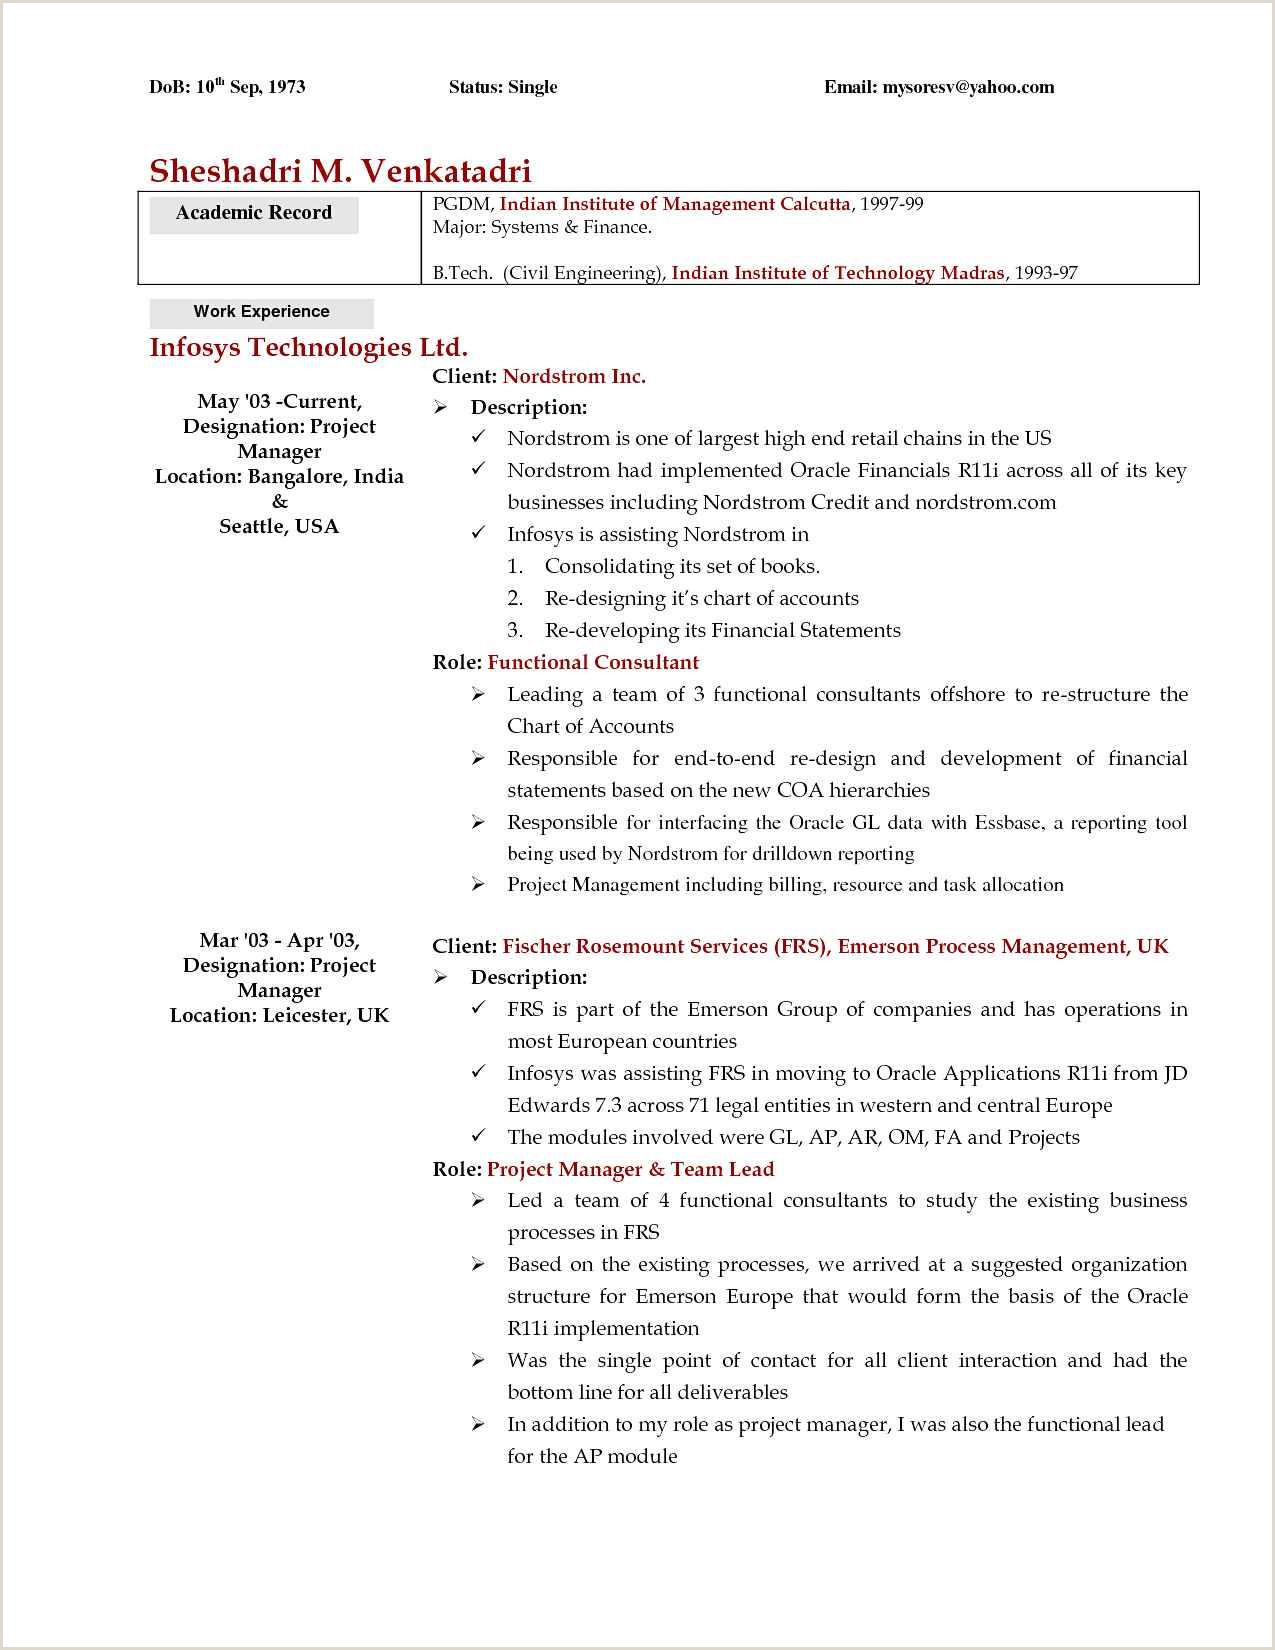 Cv Format For Job In India Resume Template Freeoard Member Sampleuilder My Format And